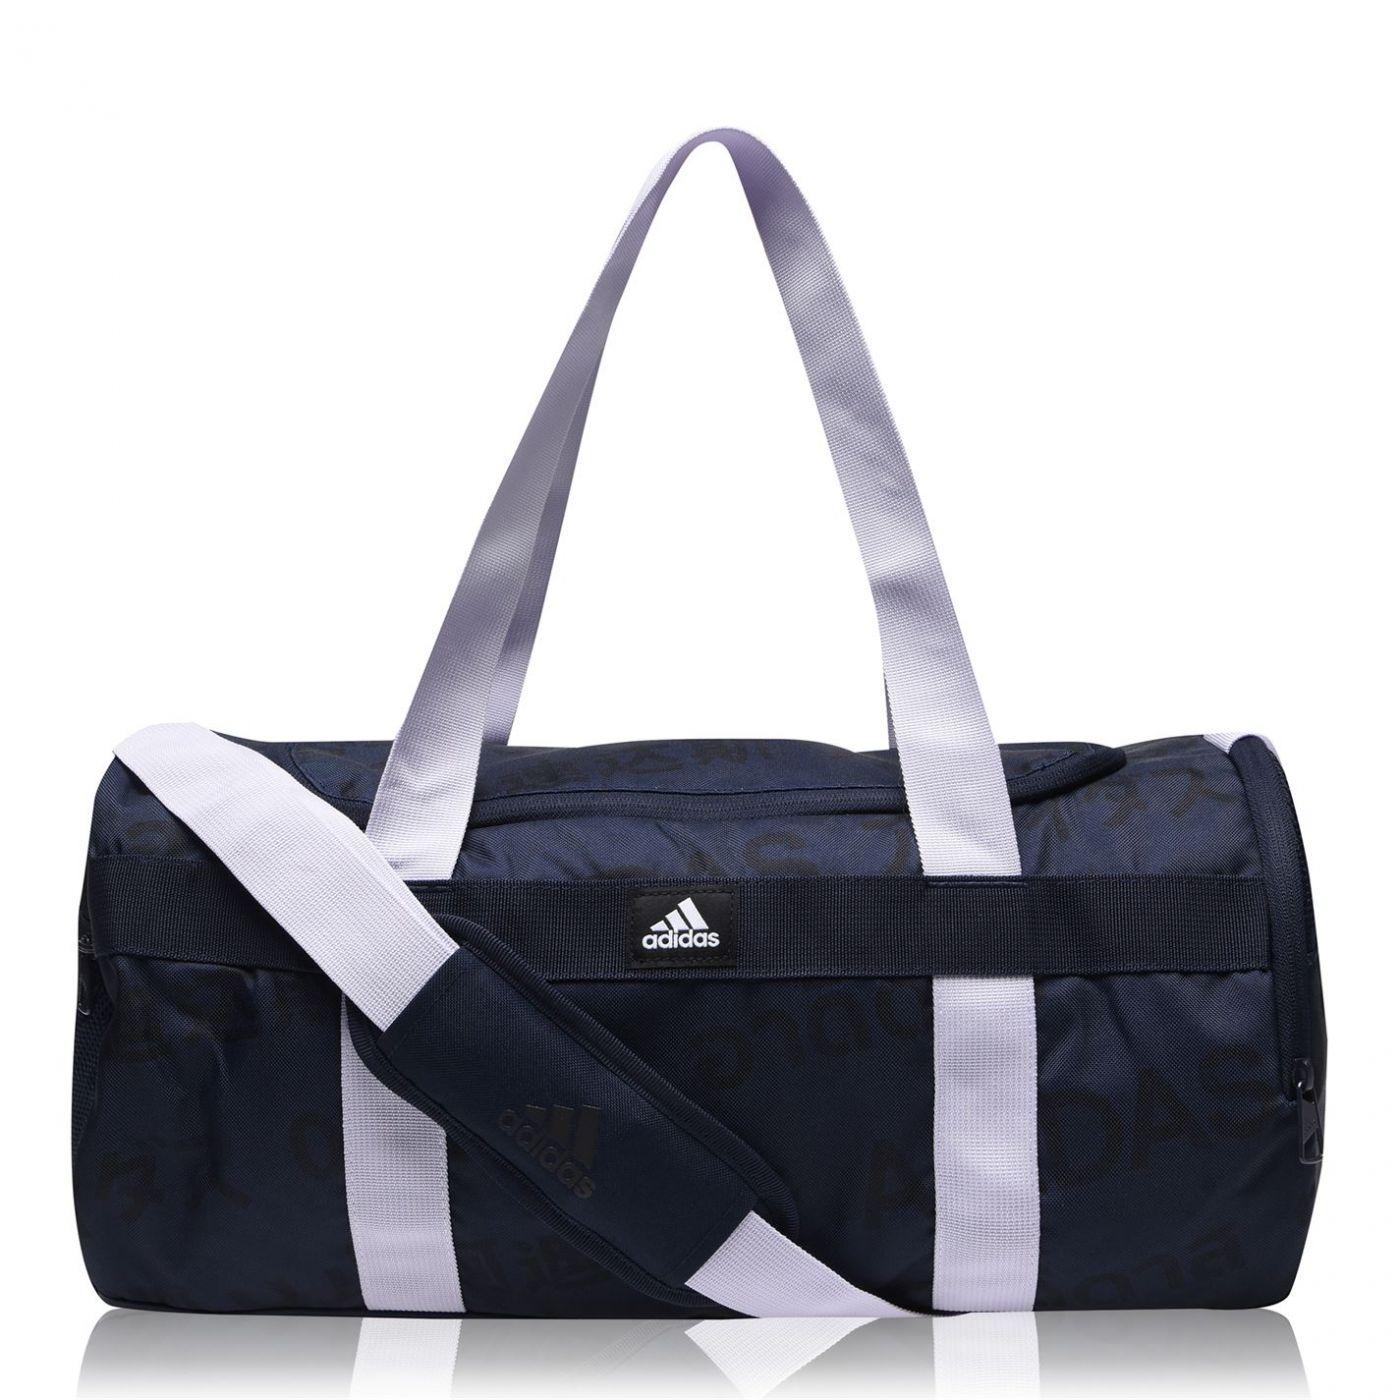 Adidas Ath Duffel S Ld02